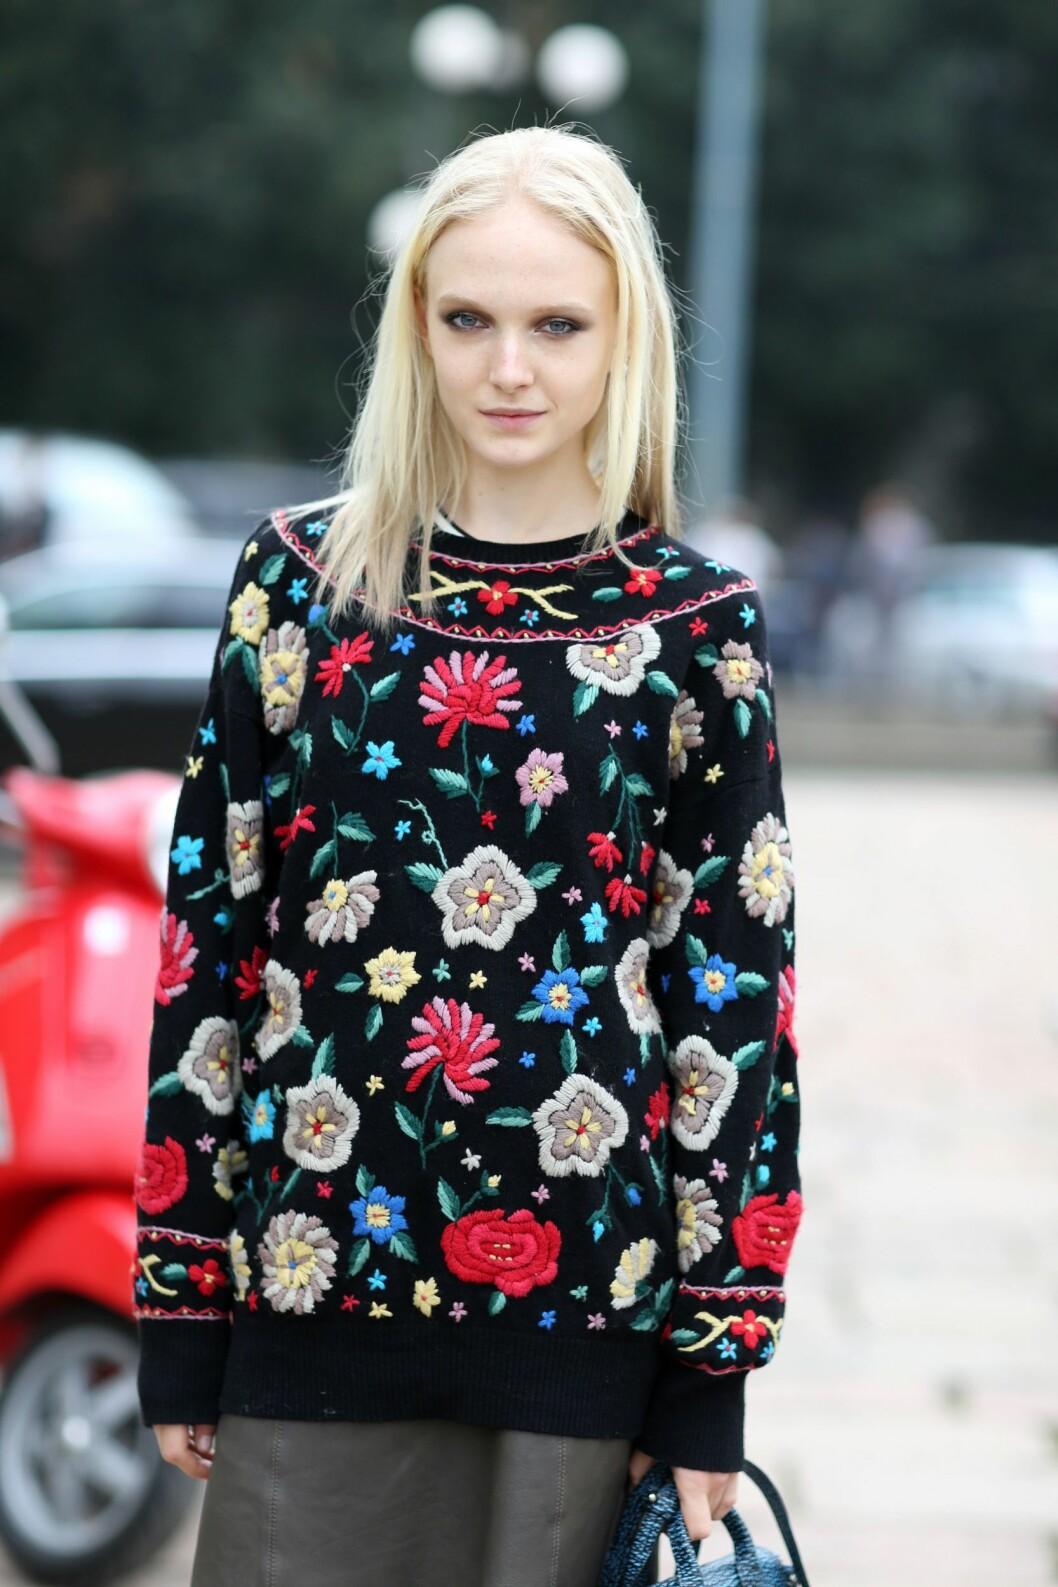 Vinterens mest populære plagg må være strikkegenseren - hvorfor ikke prøve en med blomstermønster? Foto: All Over